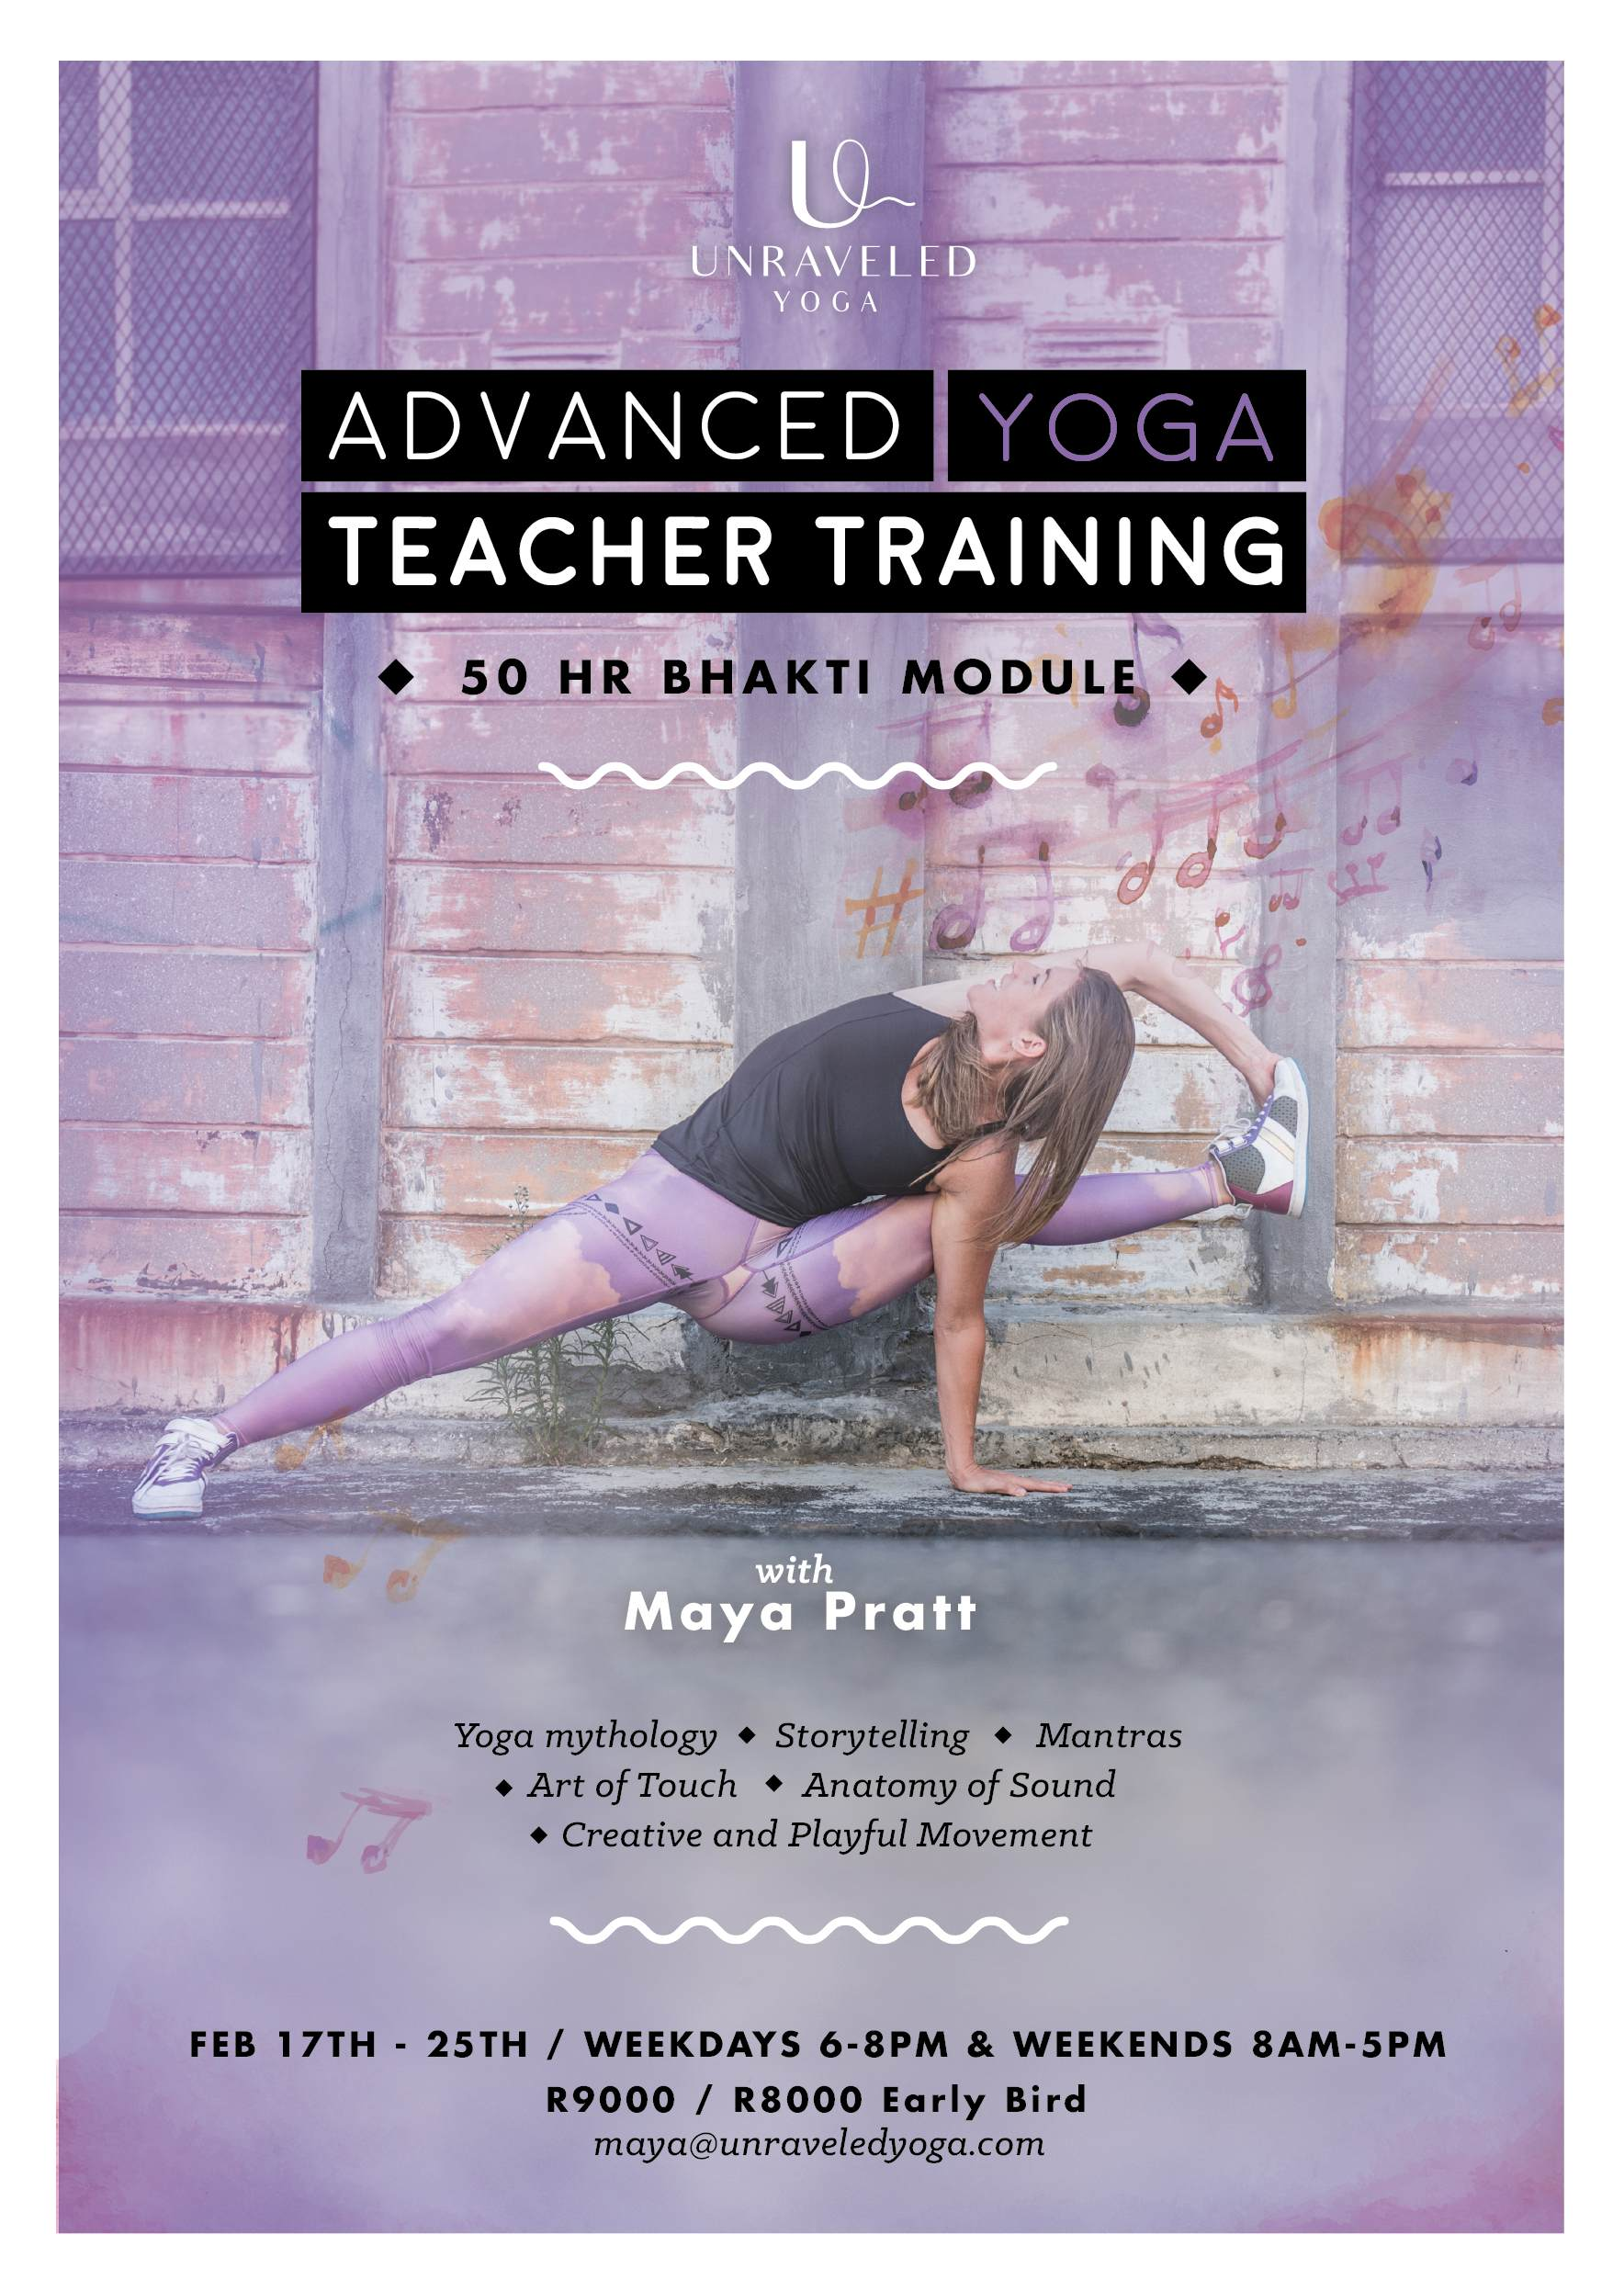 cape town yoga advanced yoga teacher training